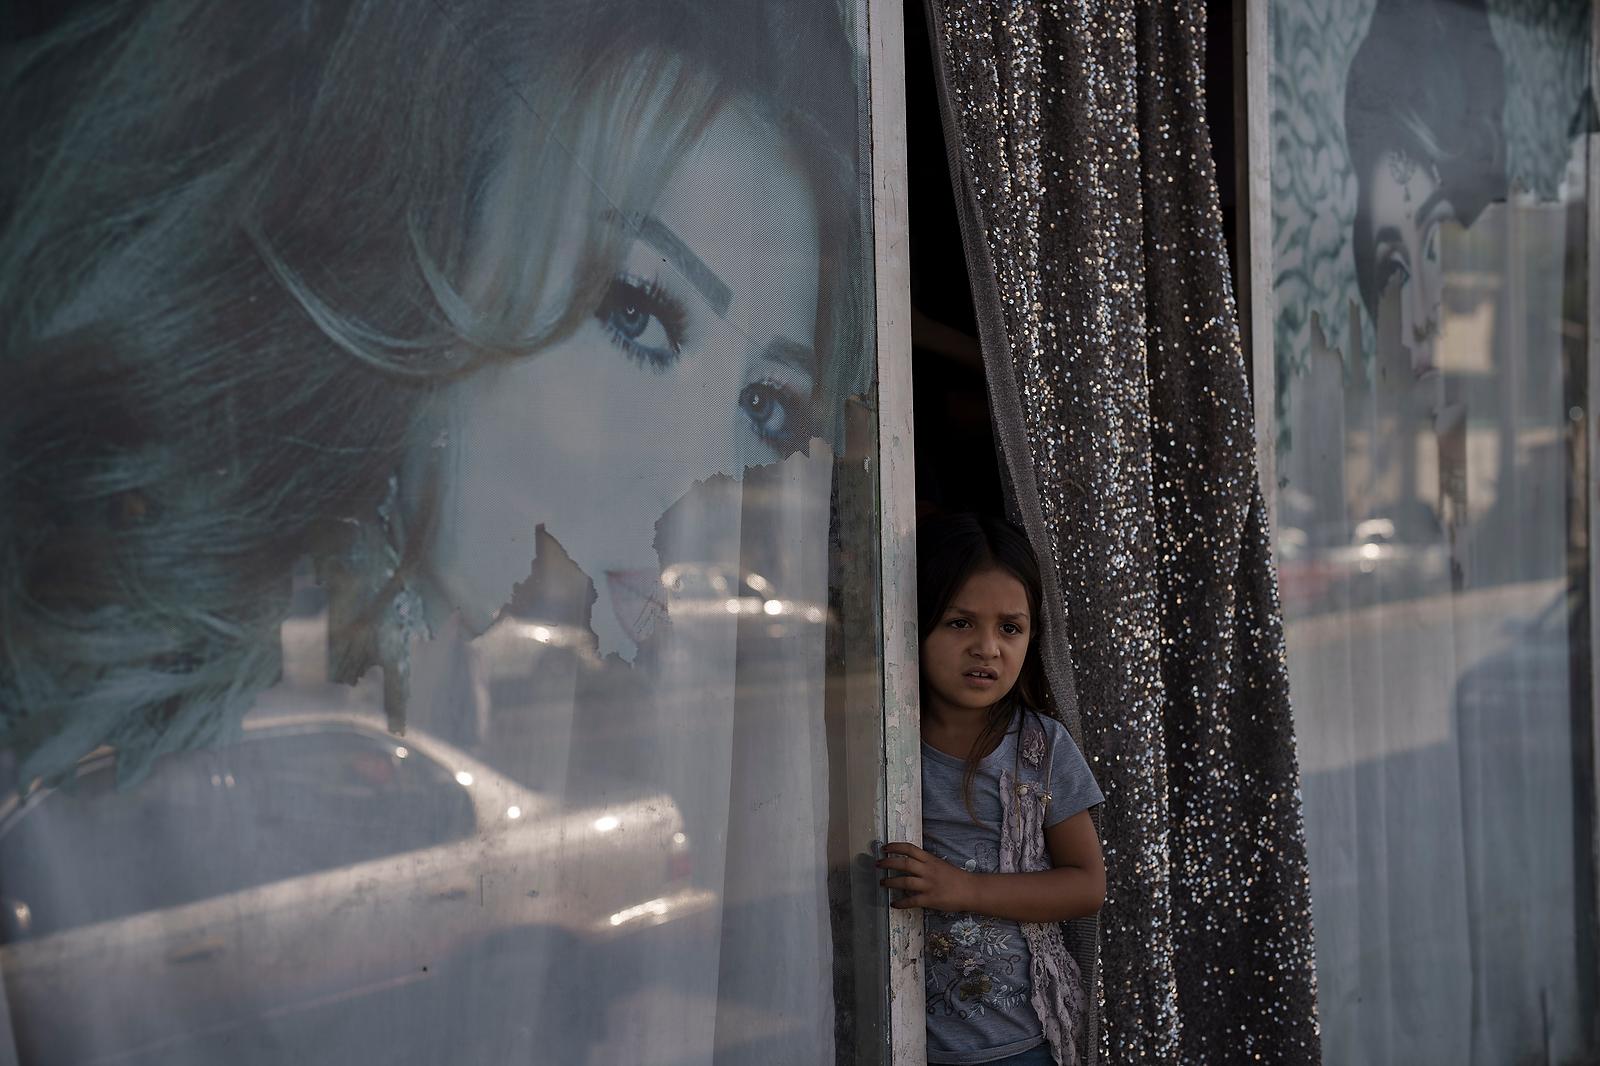 An Afghan girl looks out from a beauty salon in Kabul, Afghanistan, Thursday, Sept. 16, 2021. AP